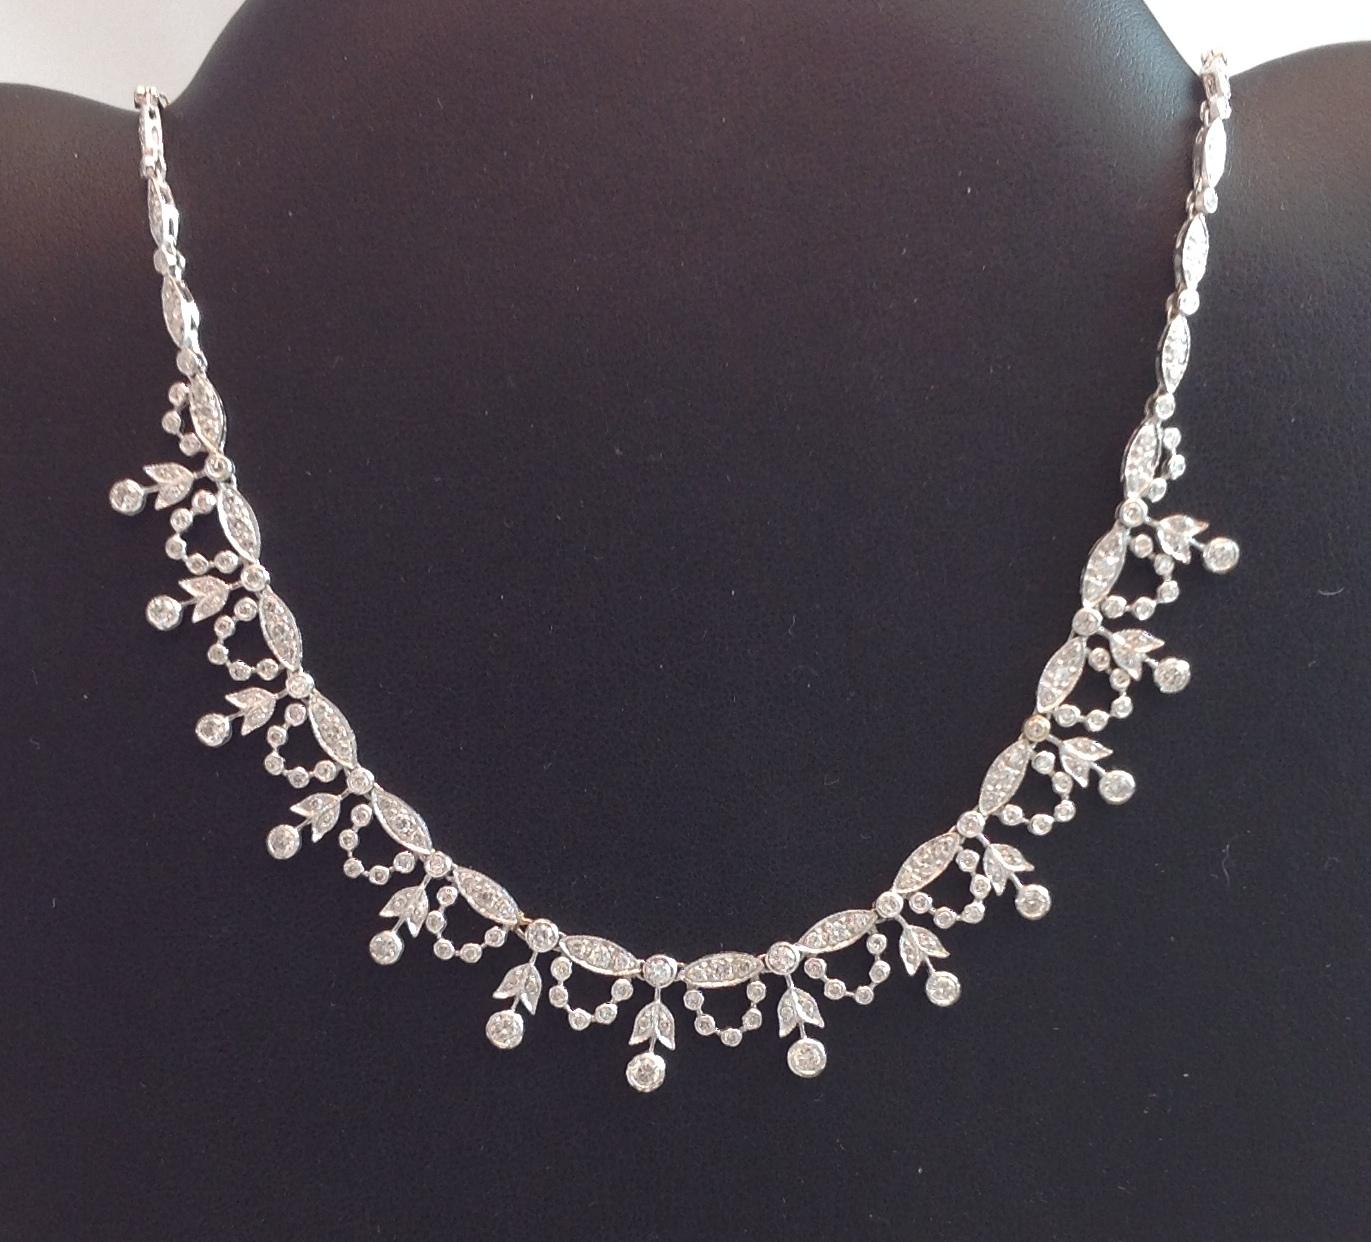 14kt White Gold Diamond Neckpiece